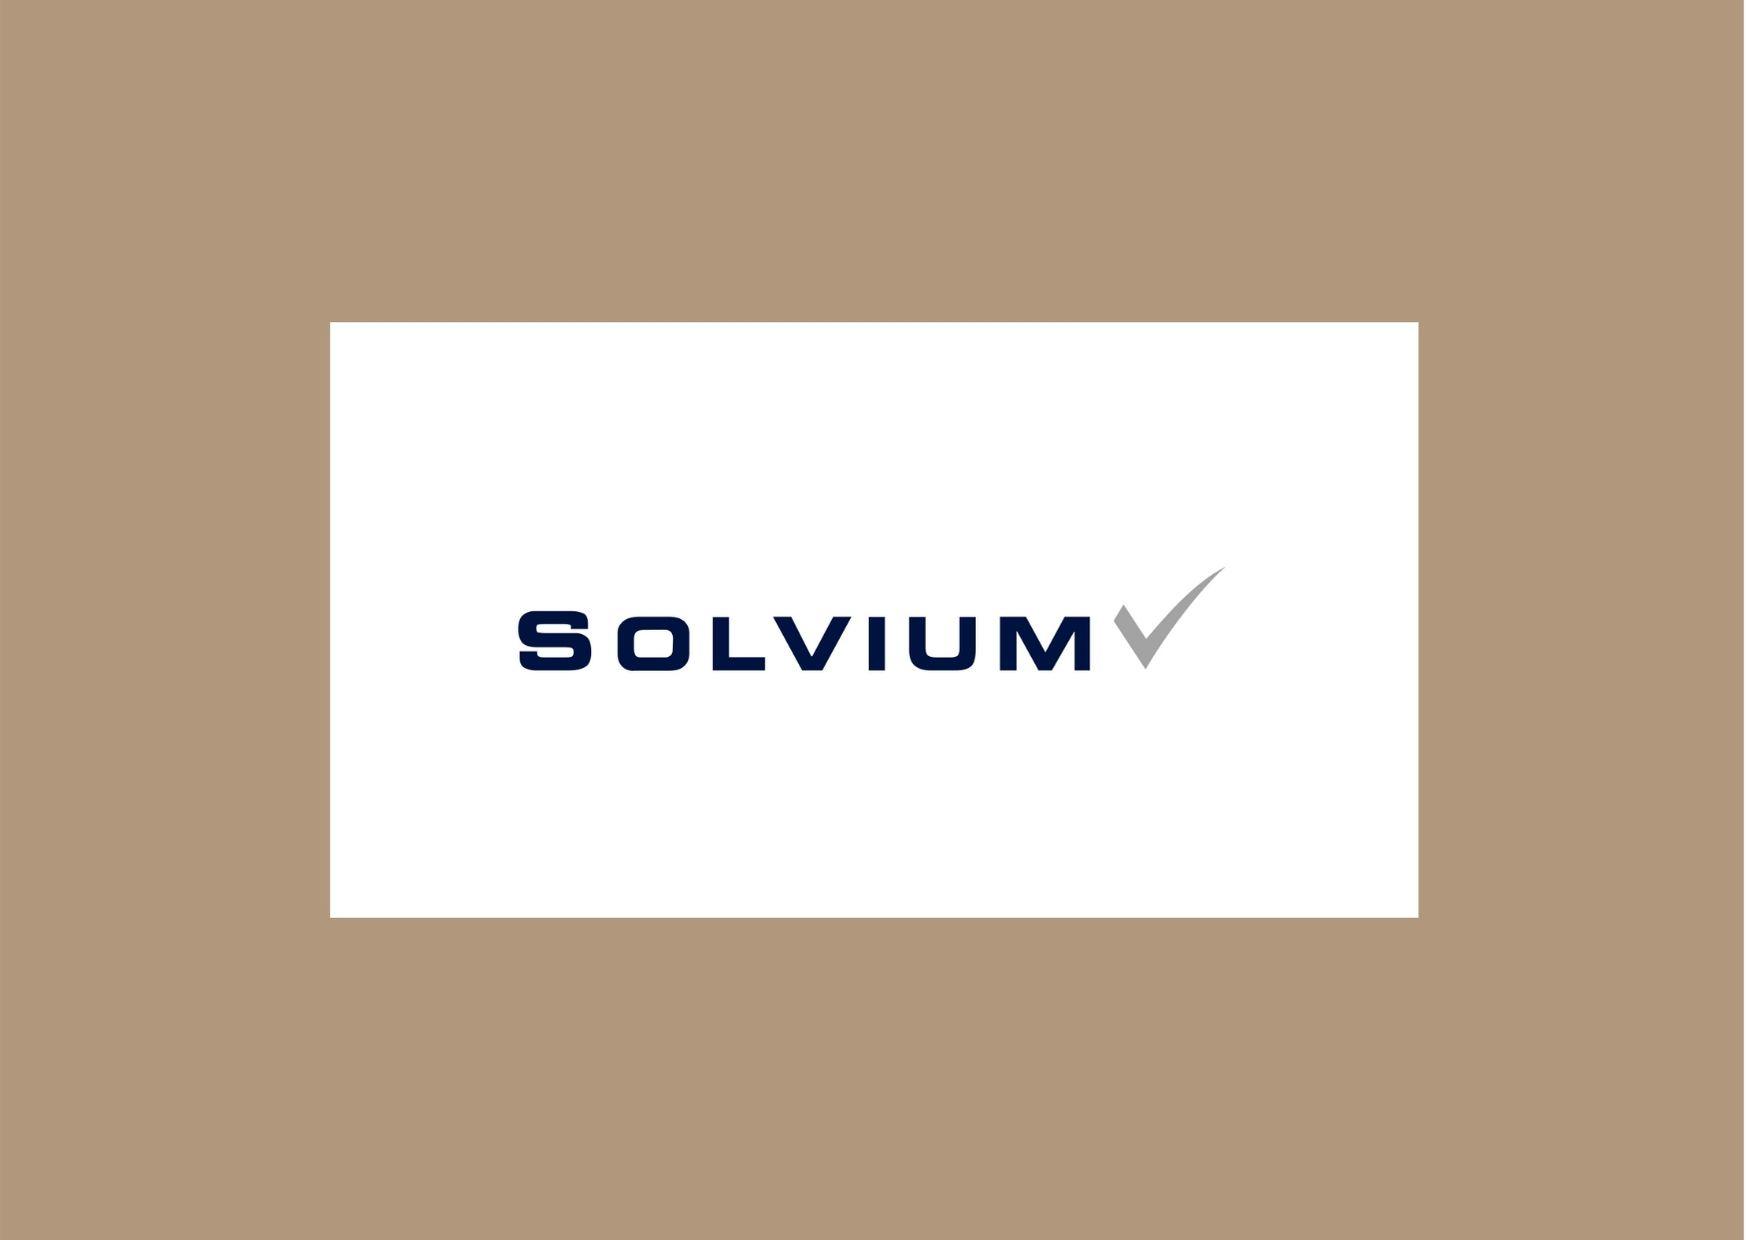 Solvium Halle Saale